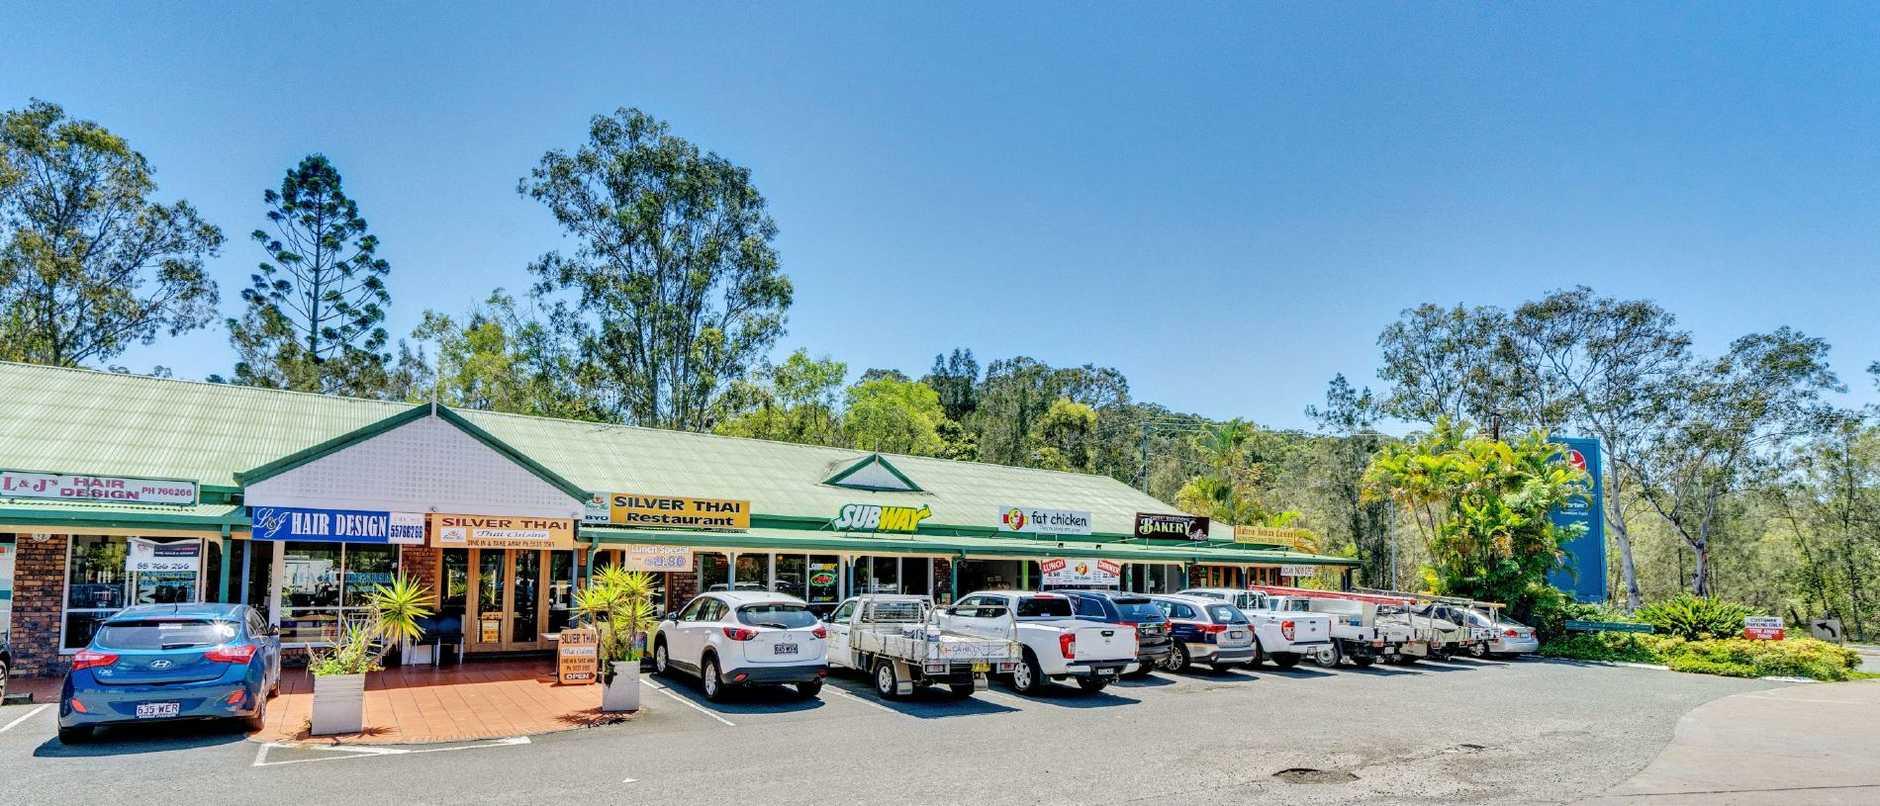 A shopping centre at 5-7 Tallebudgera Creek Rd, Burleigh Heads, has sold.